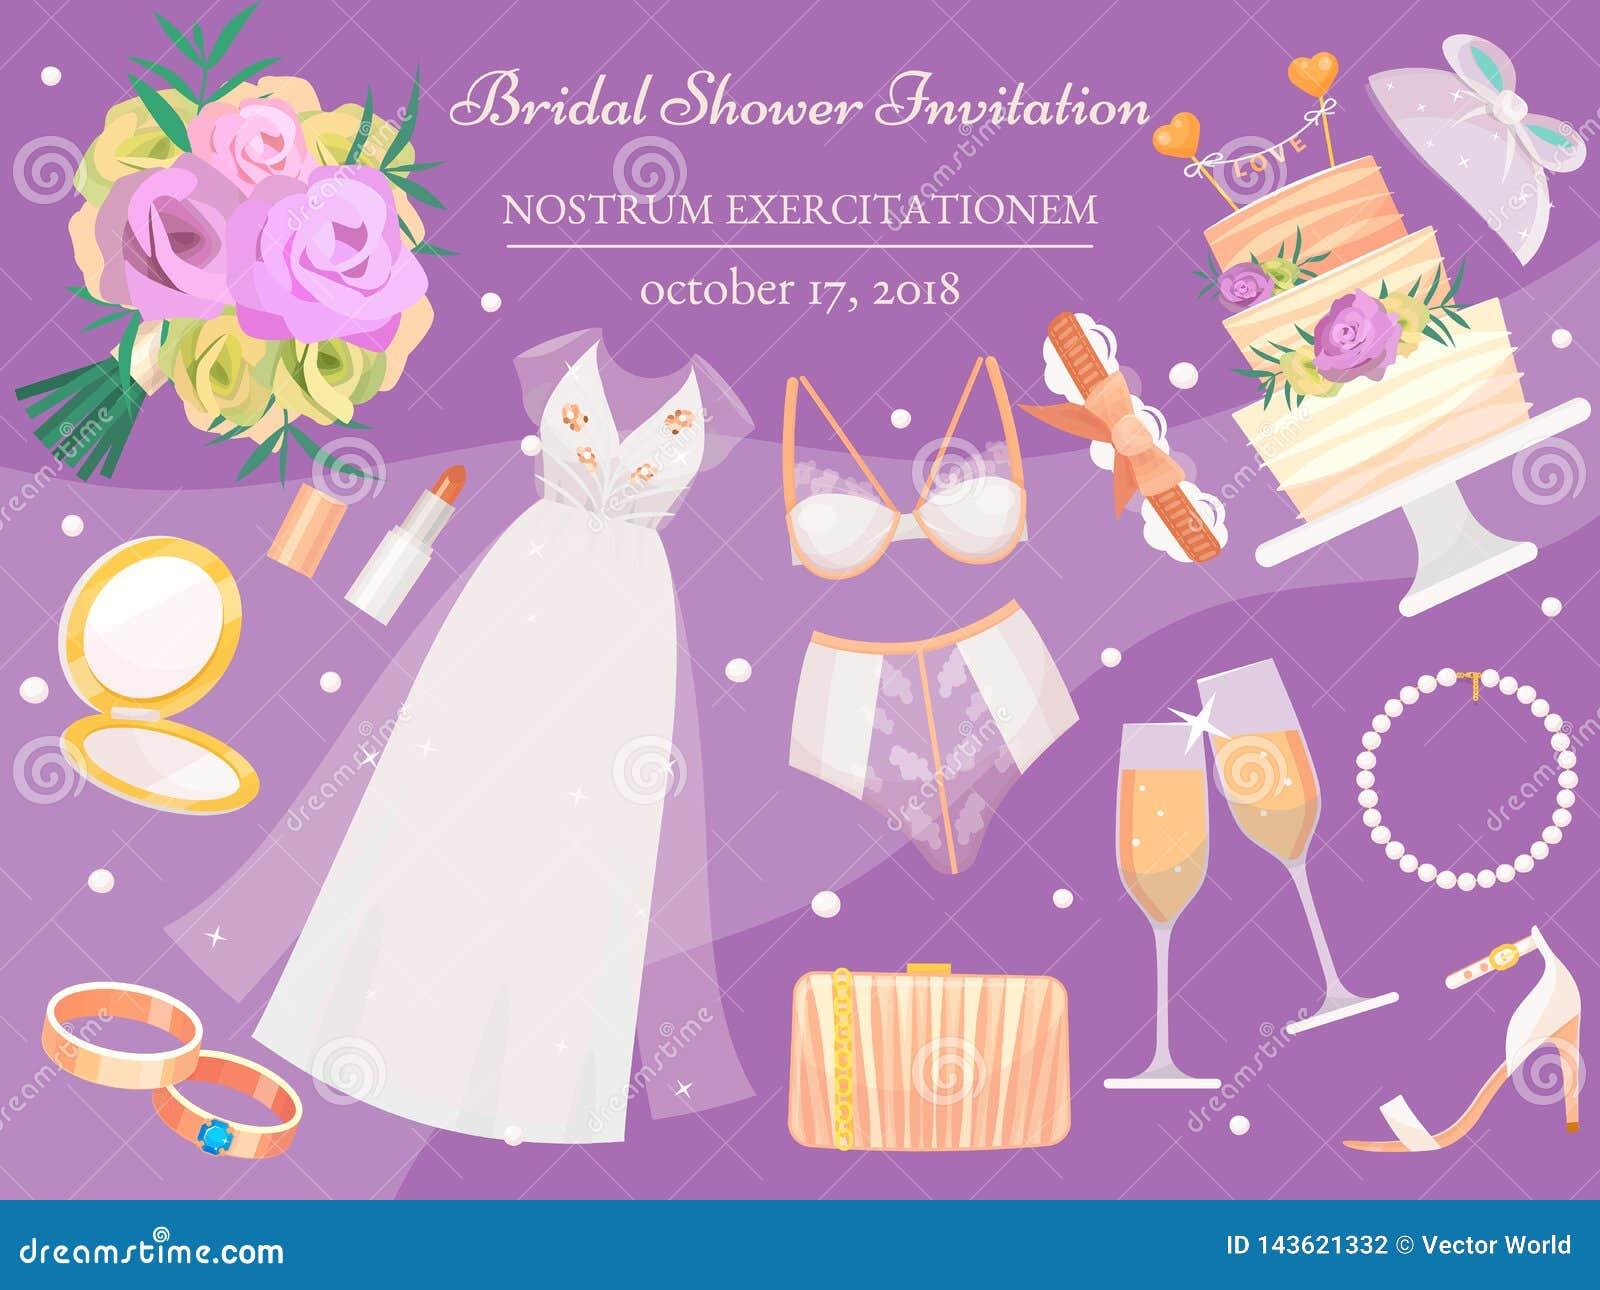 Bridal Shower Invitation Banner Vector Illustration Wedding